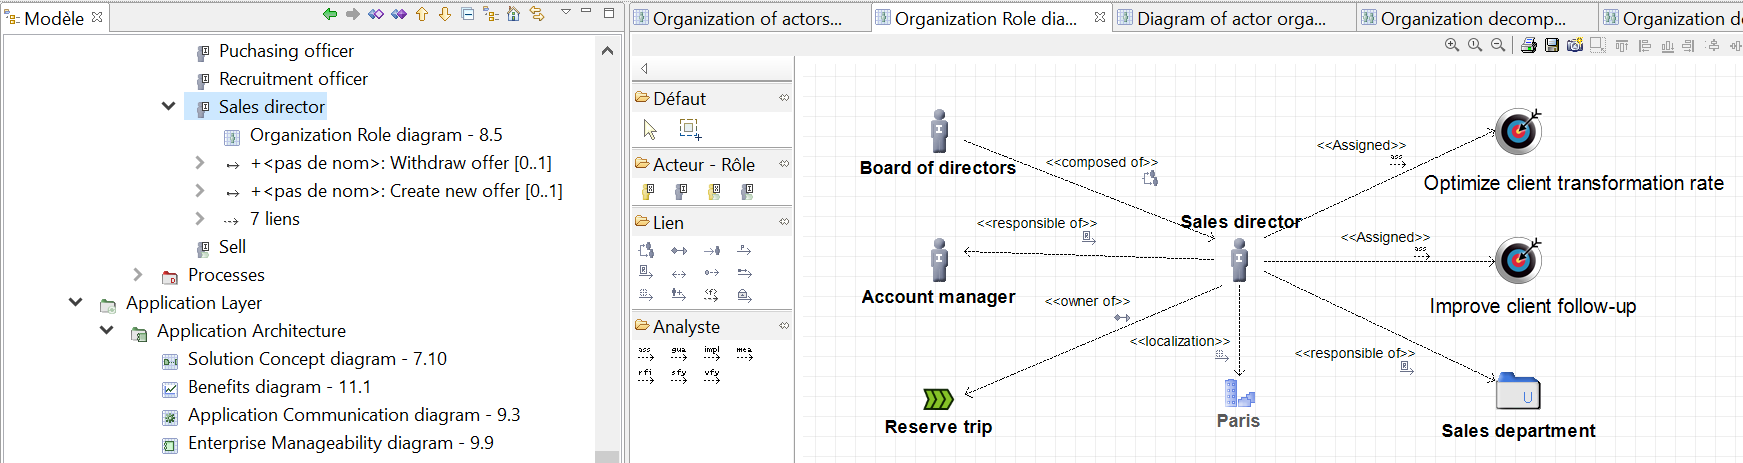 etude-de-cas-complete-togaf-diagramme-organisation-focalise-acteur-sales-director-2.PNG